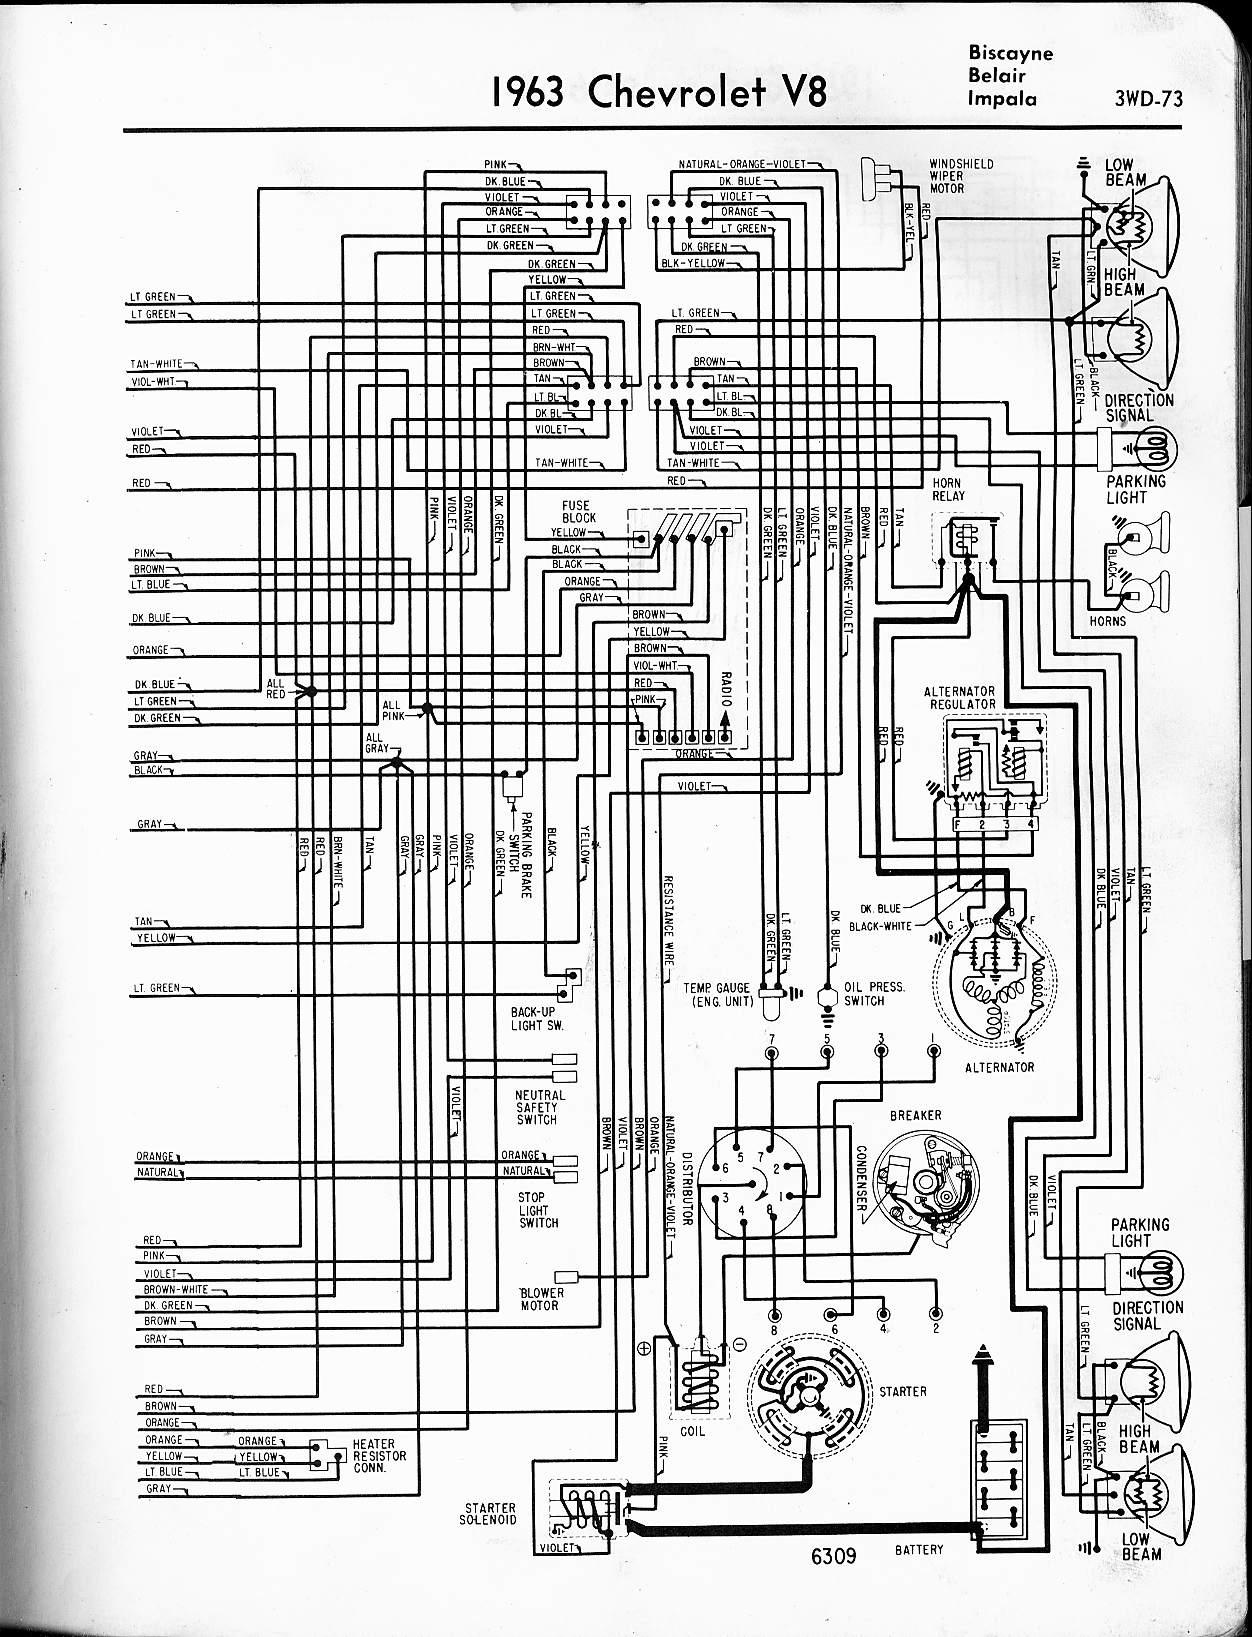 1970 chevrolet impala wiring diagram